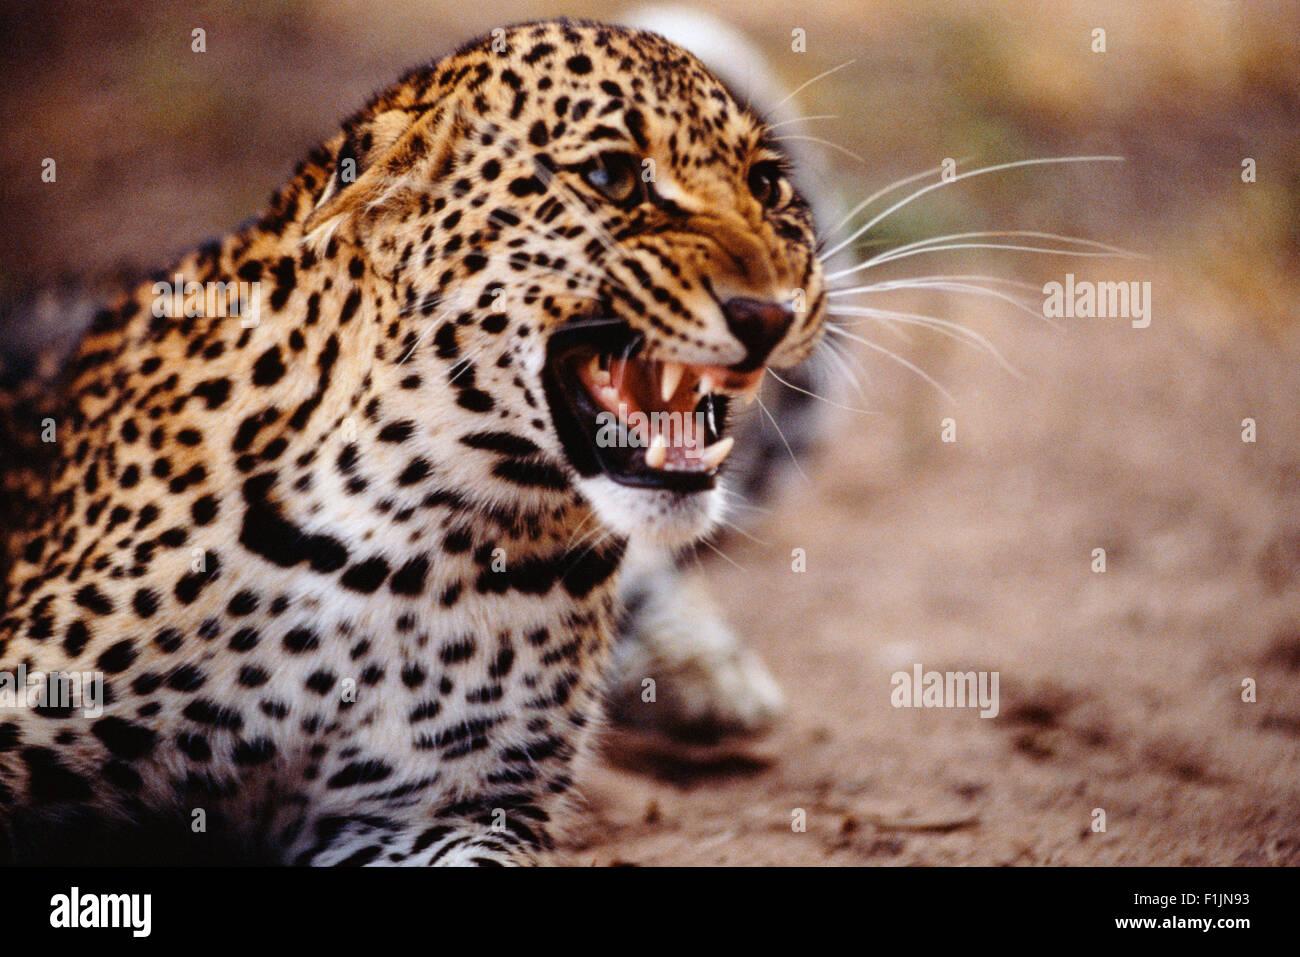 Leopard Snarling - Stock Image